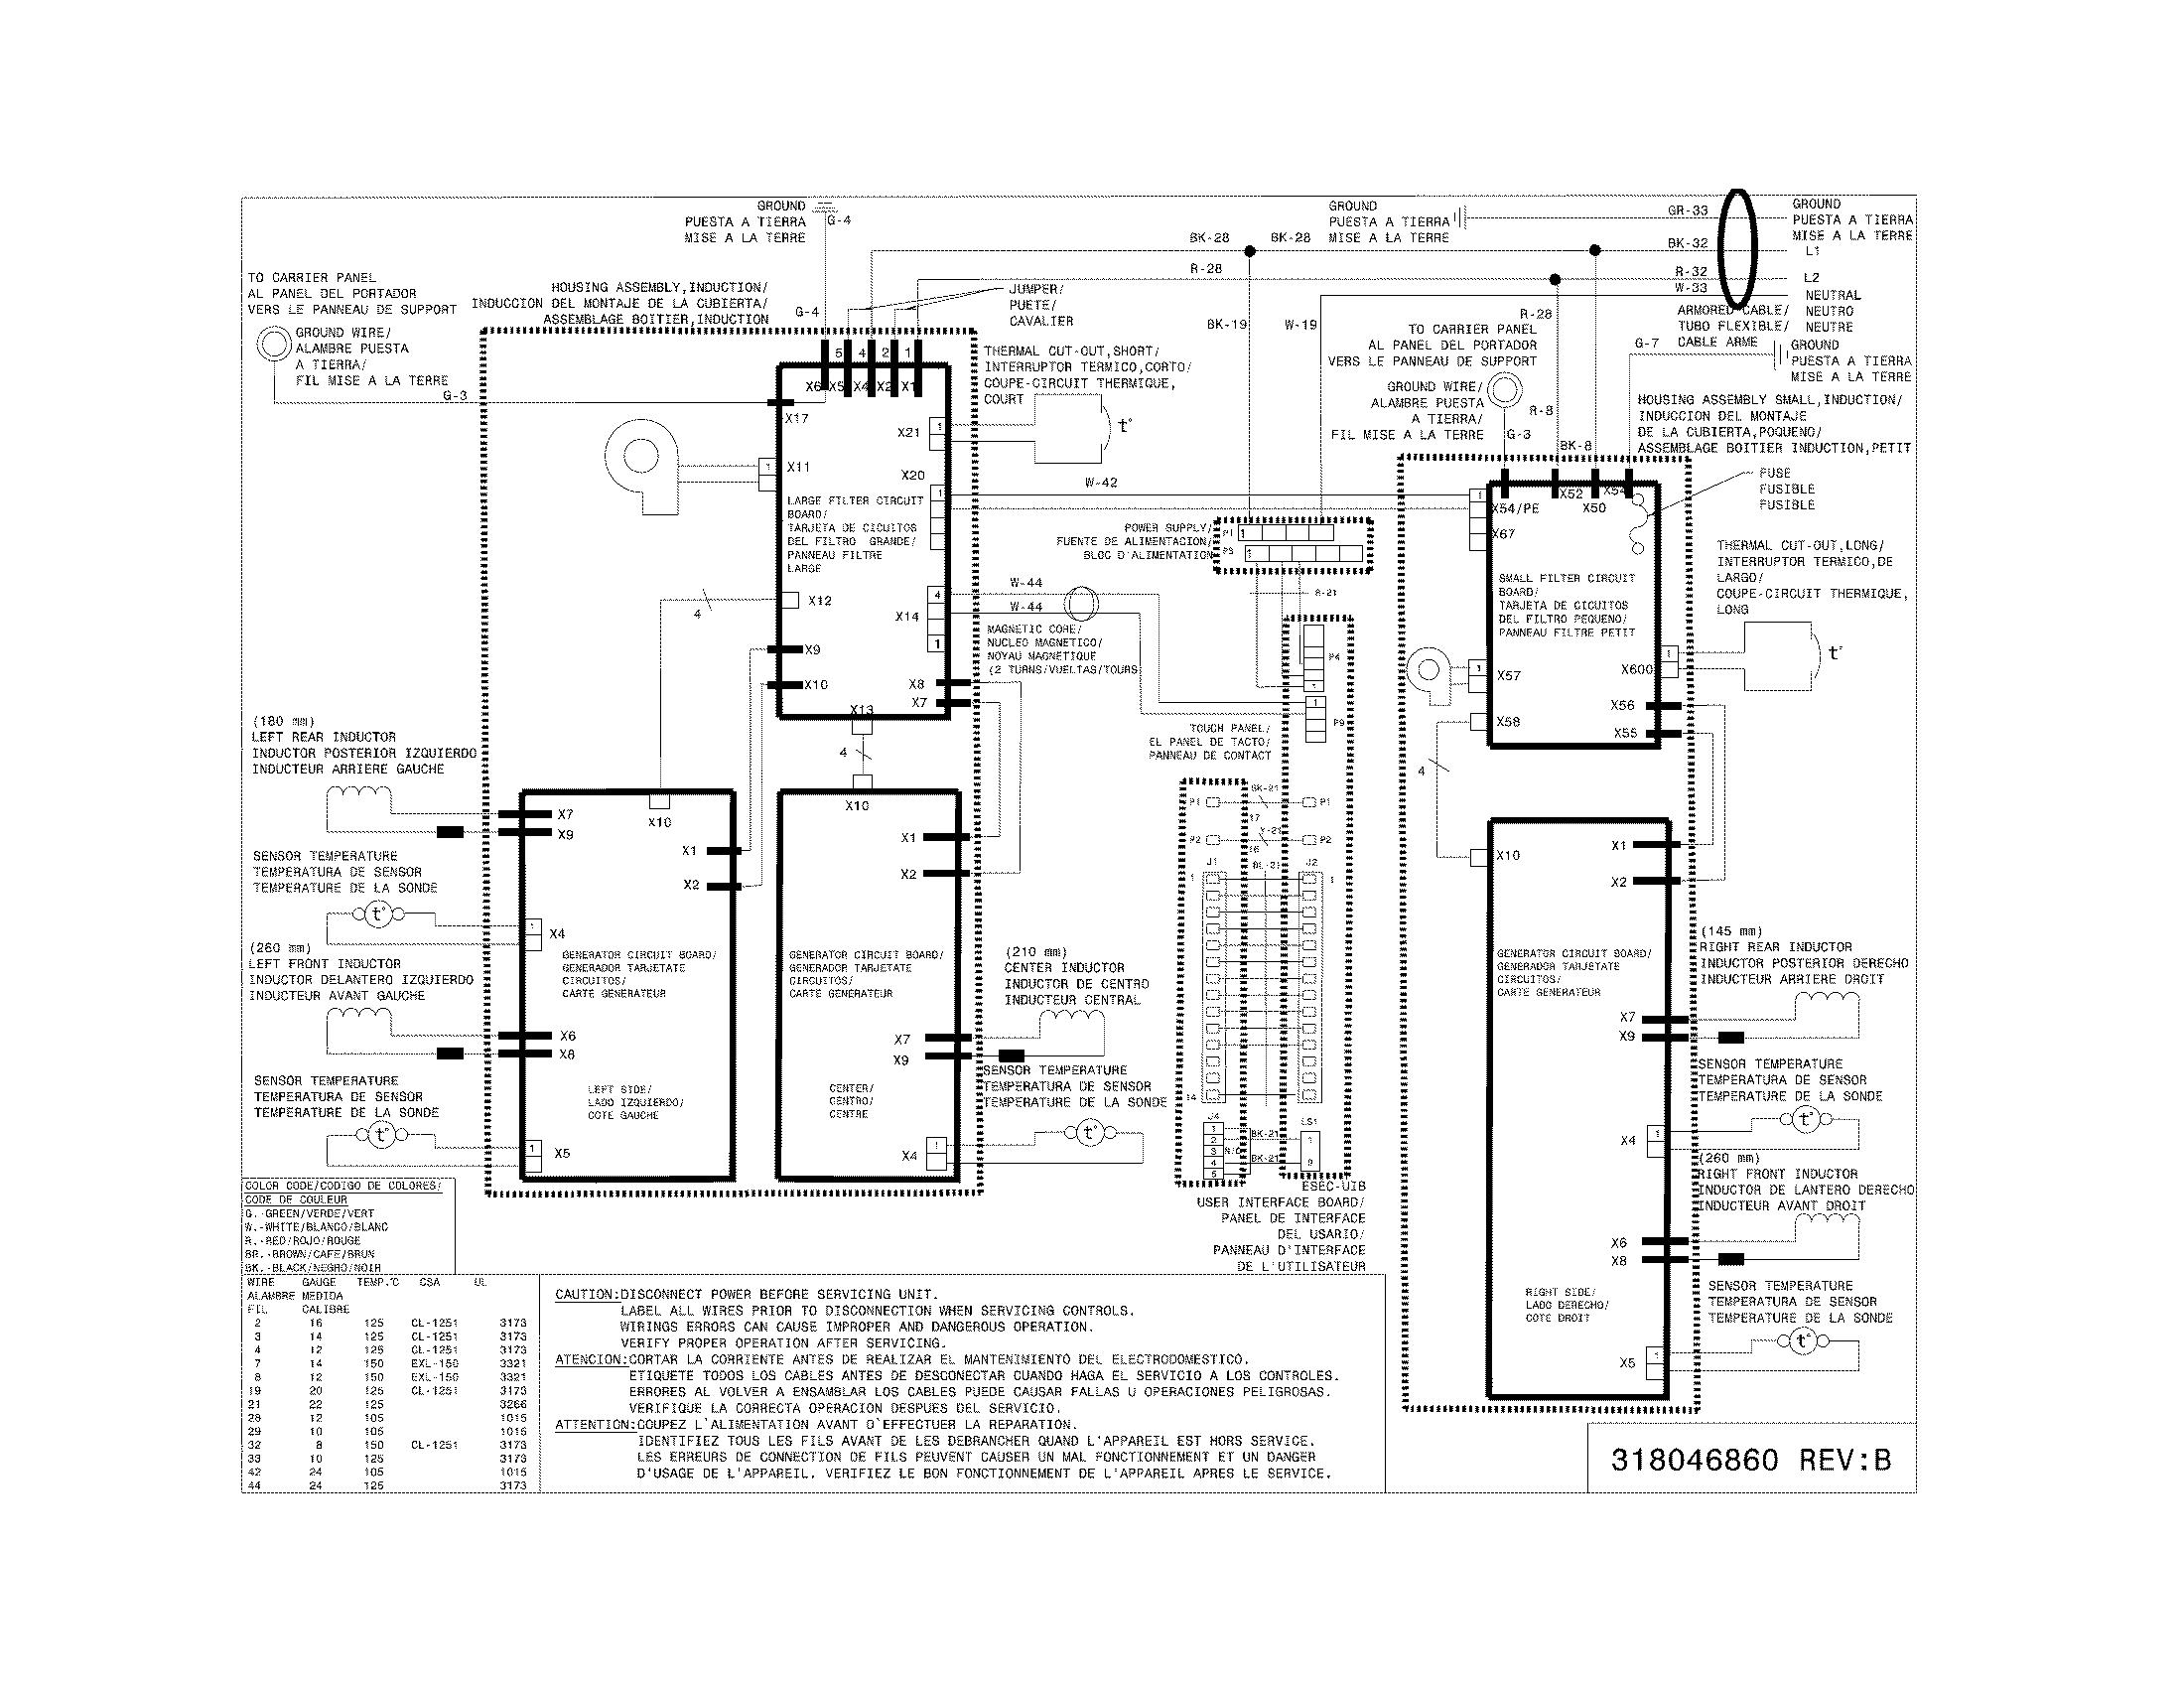 Marvellous 1967 Gmc Wiring Diagram Contemporary - ufc204.us ...